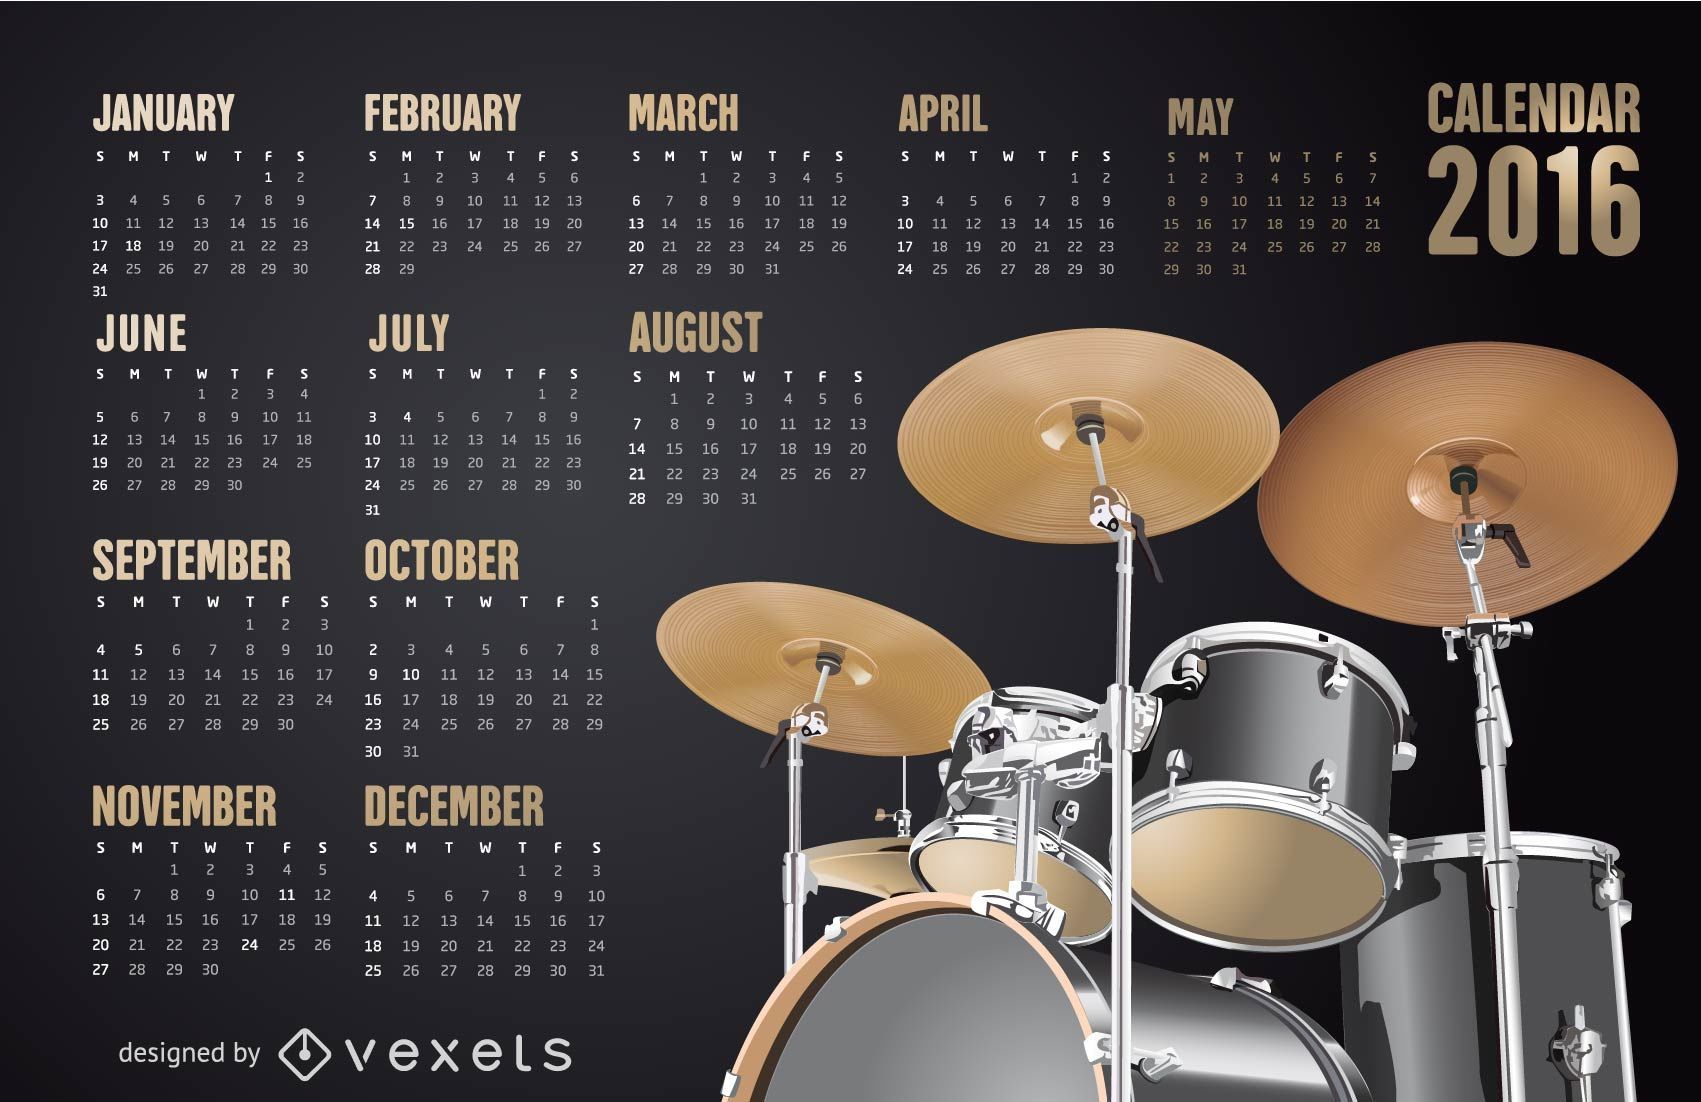 2016 Drums Calendar